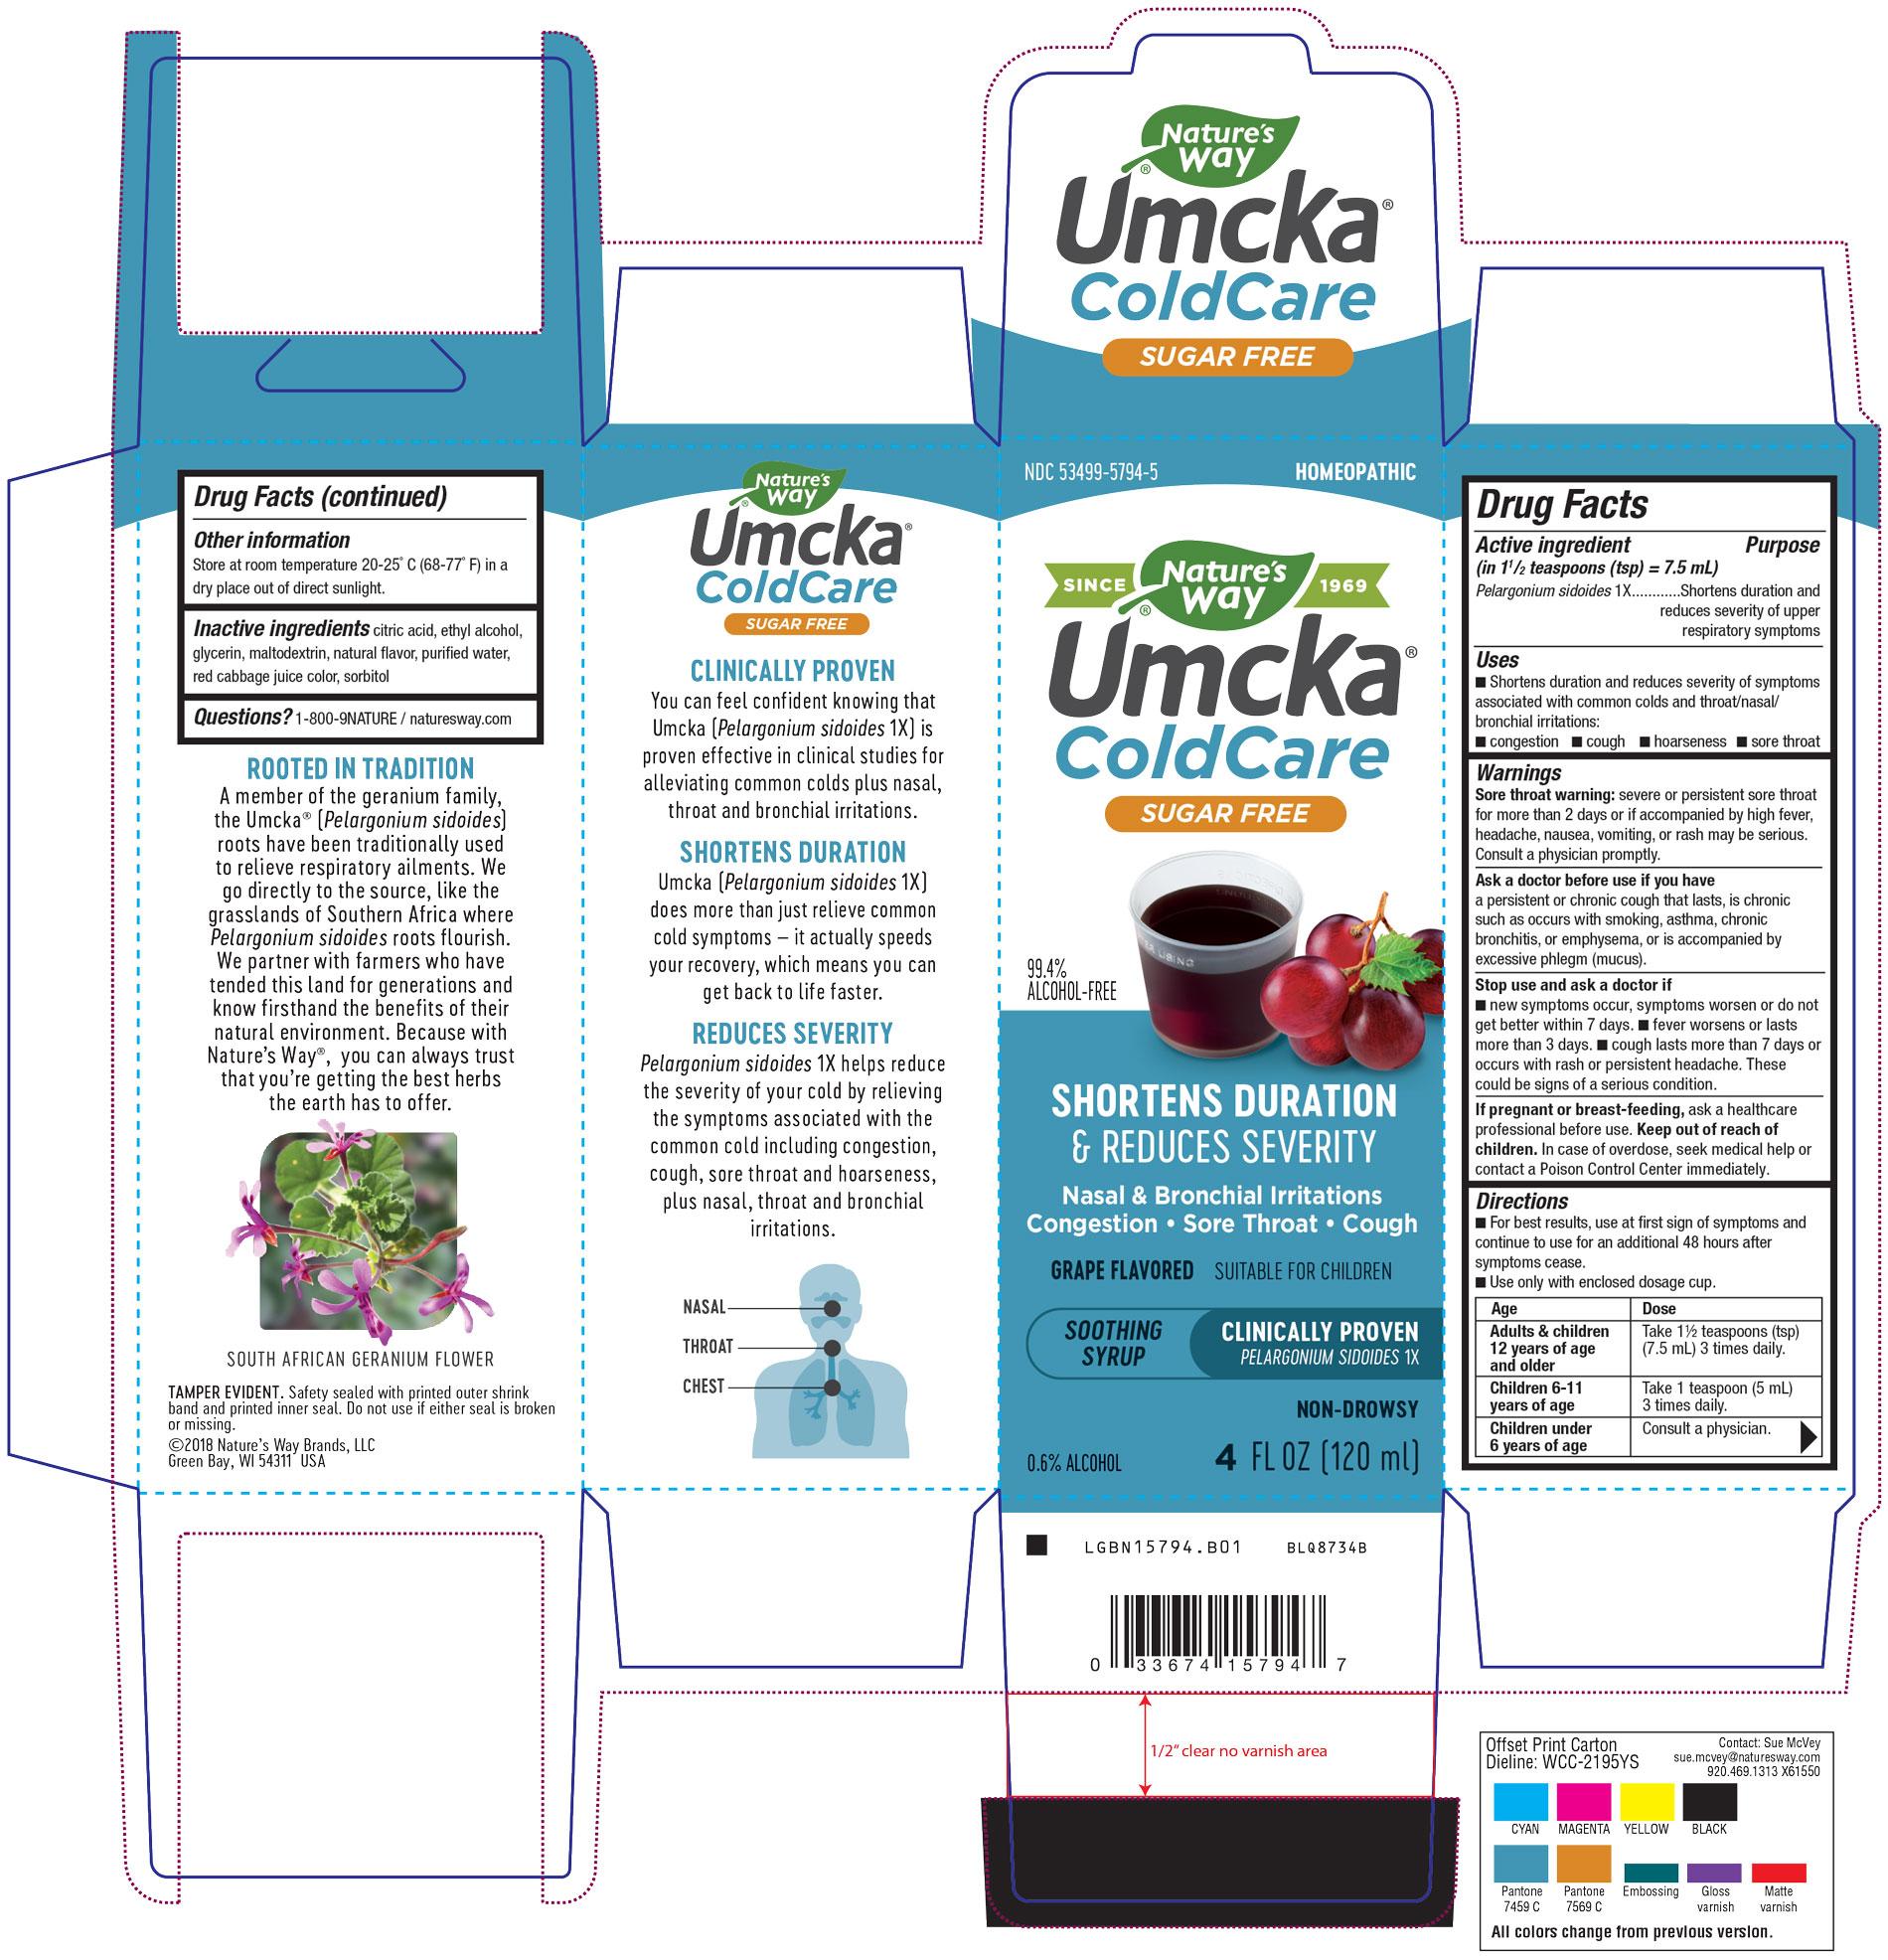 15794-Umkca-Sugar-Free-Grape-Syrup-B01.jpg